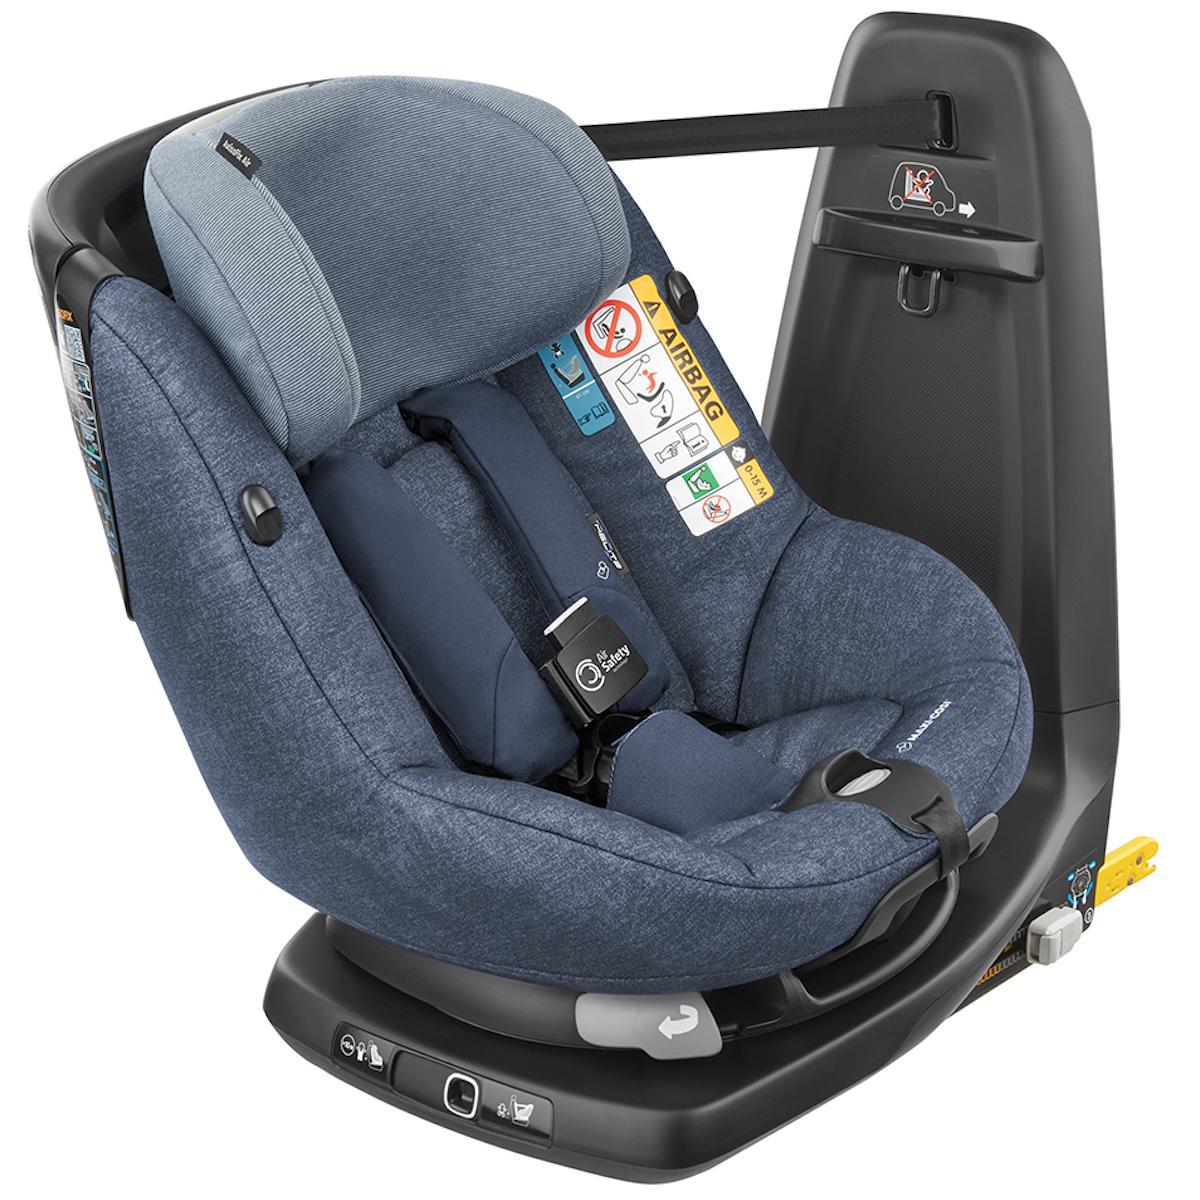 Siège auto bébé groupe 0+/1 AXISSFIX Maxi-Cosi nomad blue